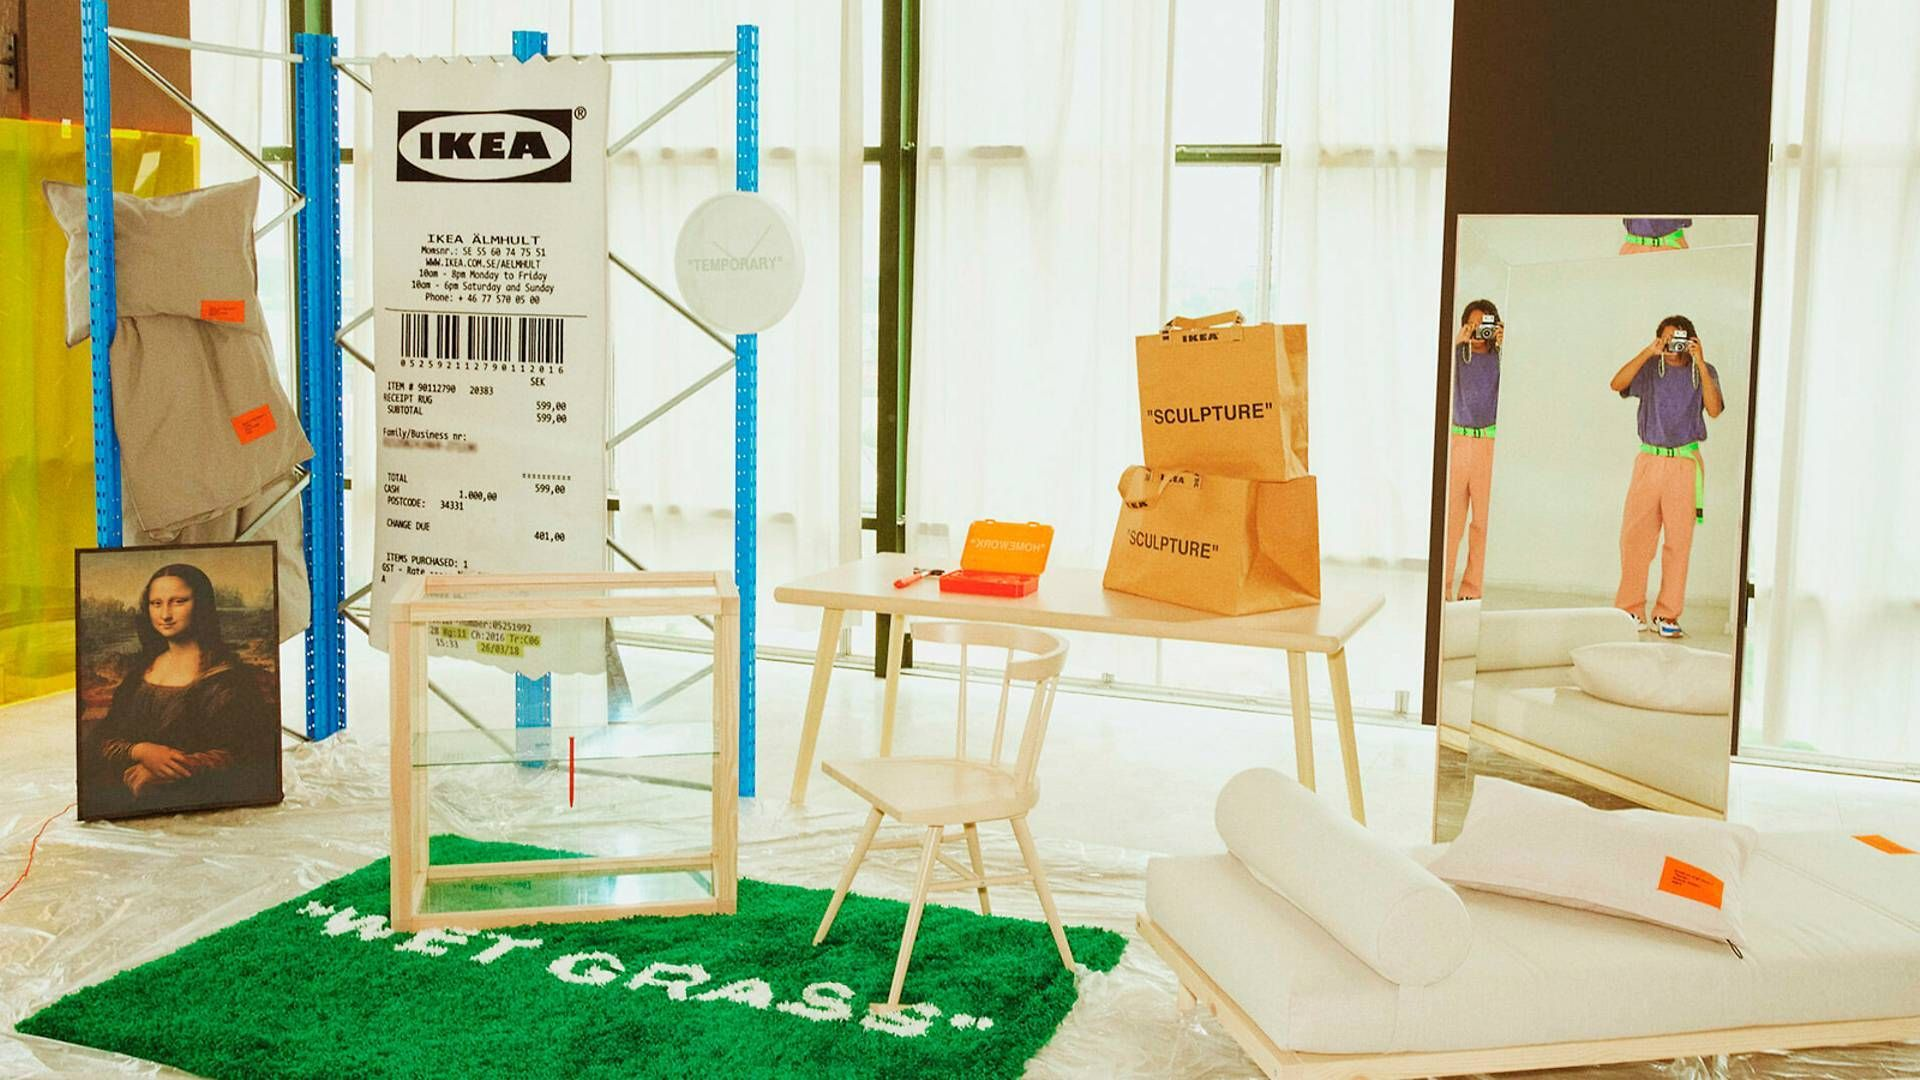 Ikea Collaboration #BuildingDesign #HomeDesign #Architecture